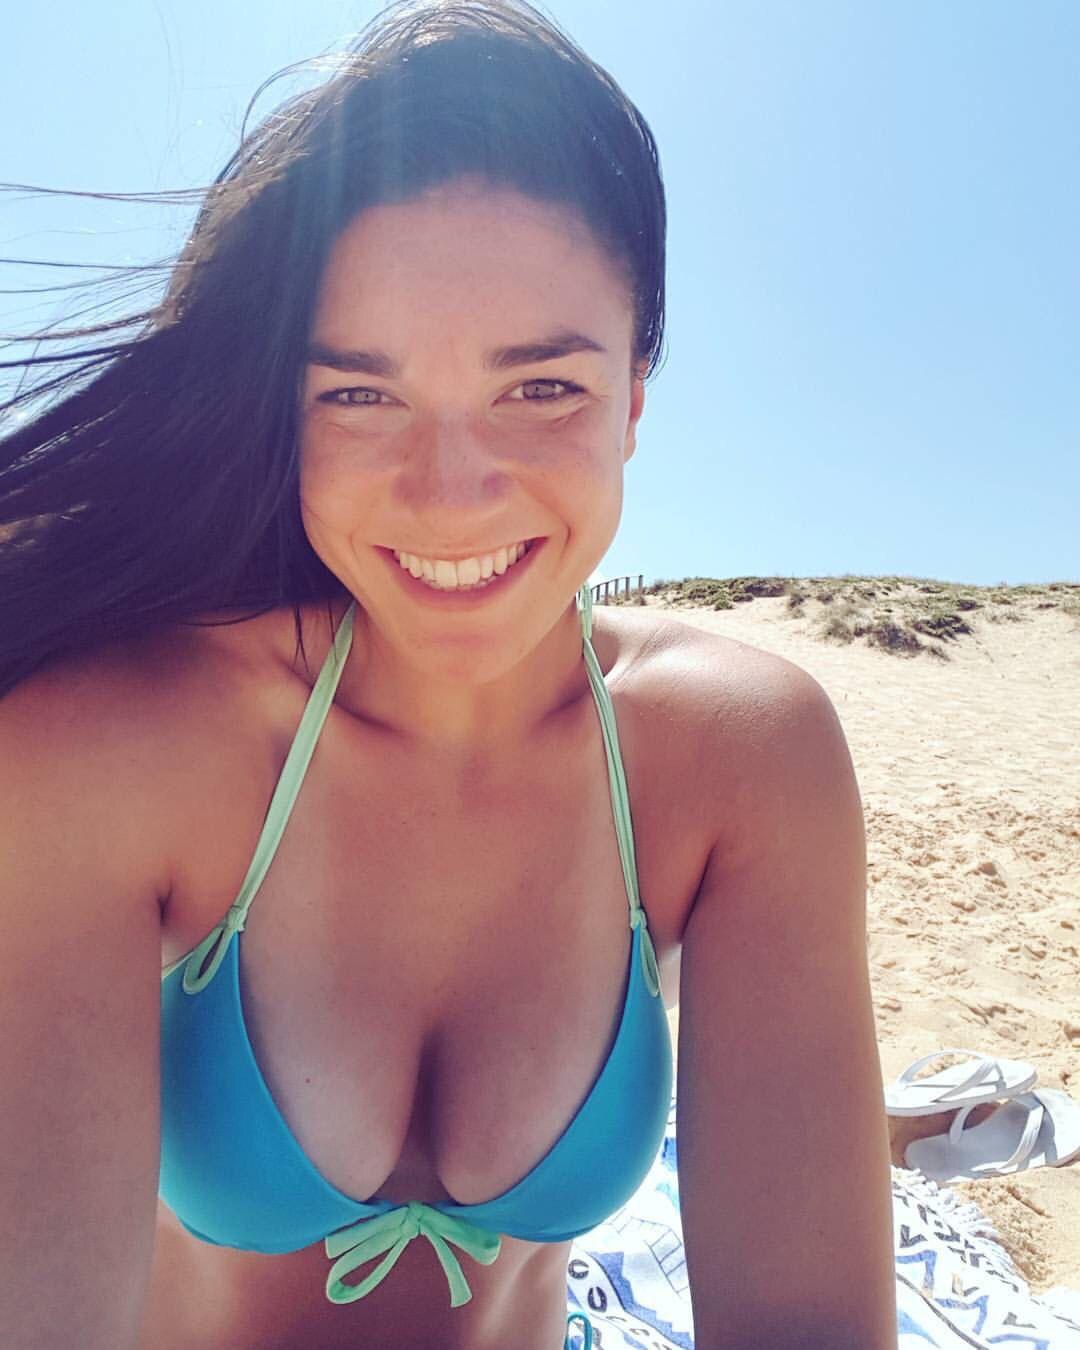 Hacked Nadine Crocker nudes (23 photo), Tits, Hot, Twitter, legs 2020